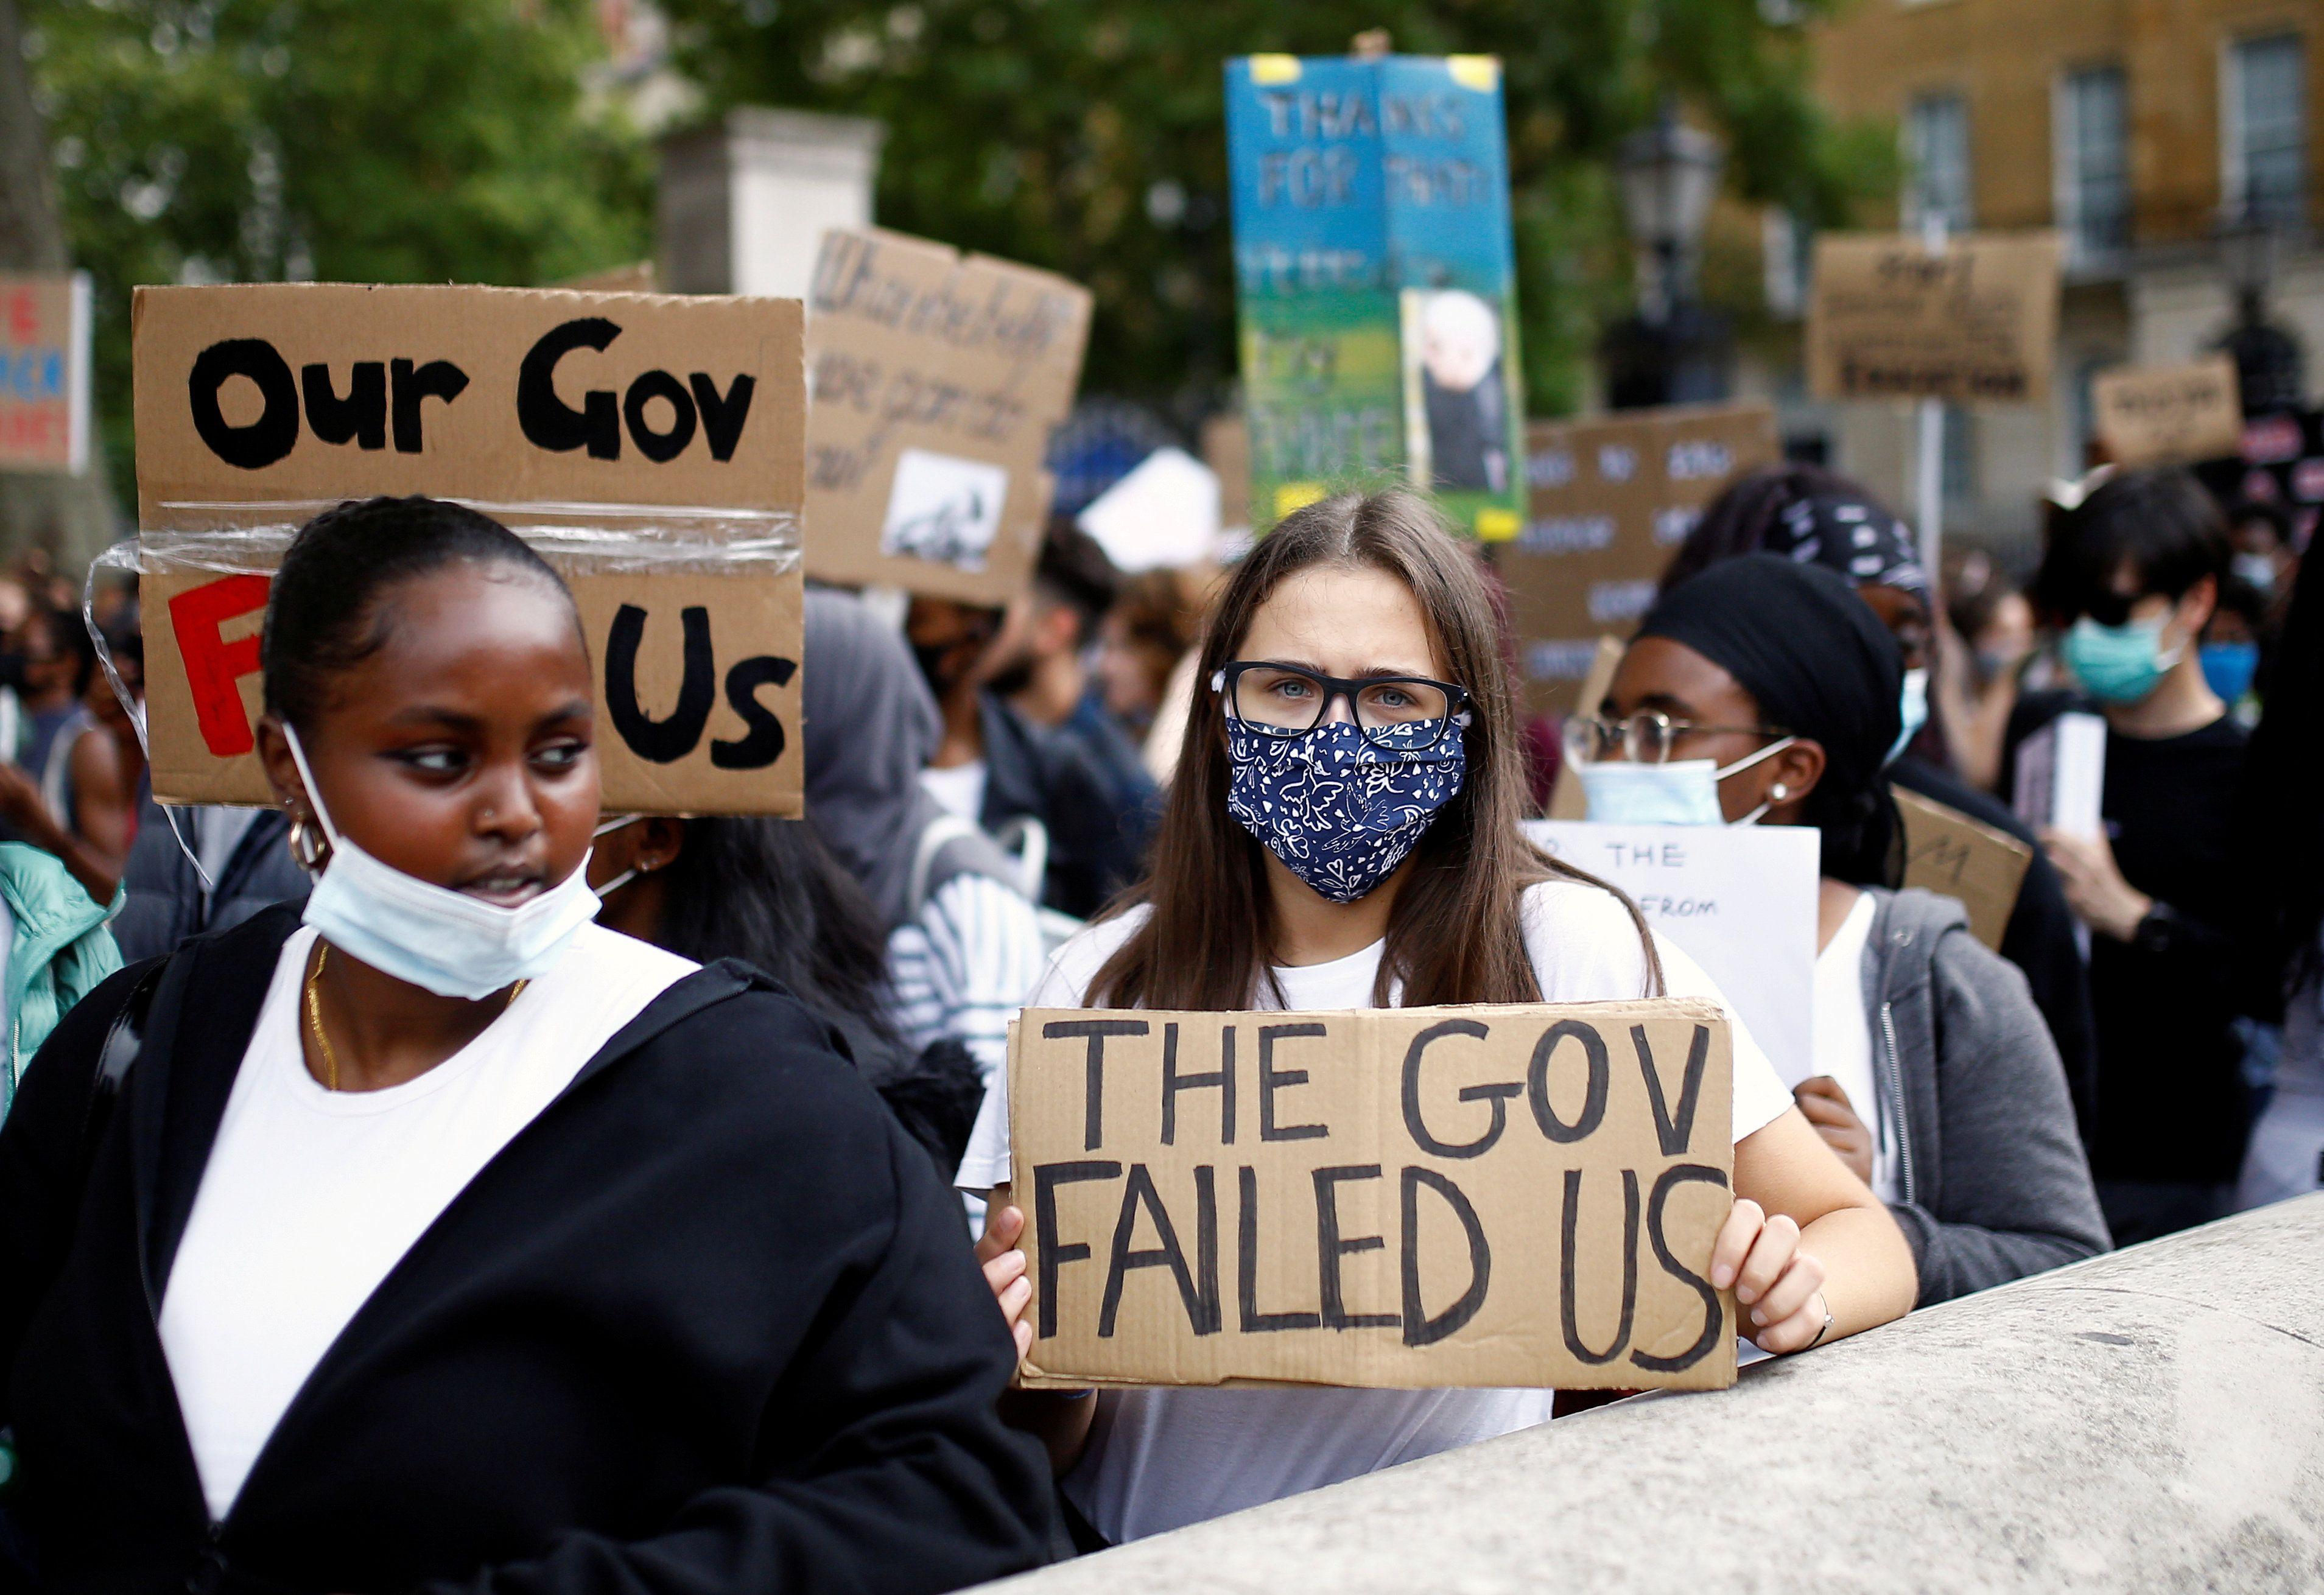 What We're Watching: UK exam fiasco, Thai protests grow, GERD negotiations resume